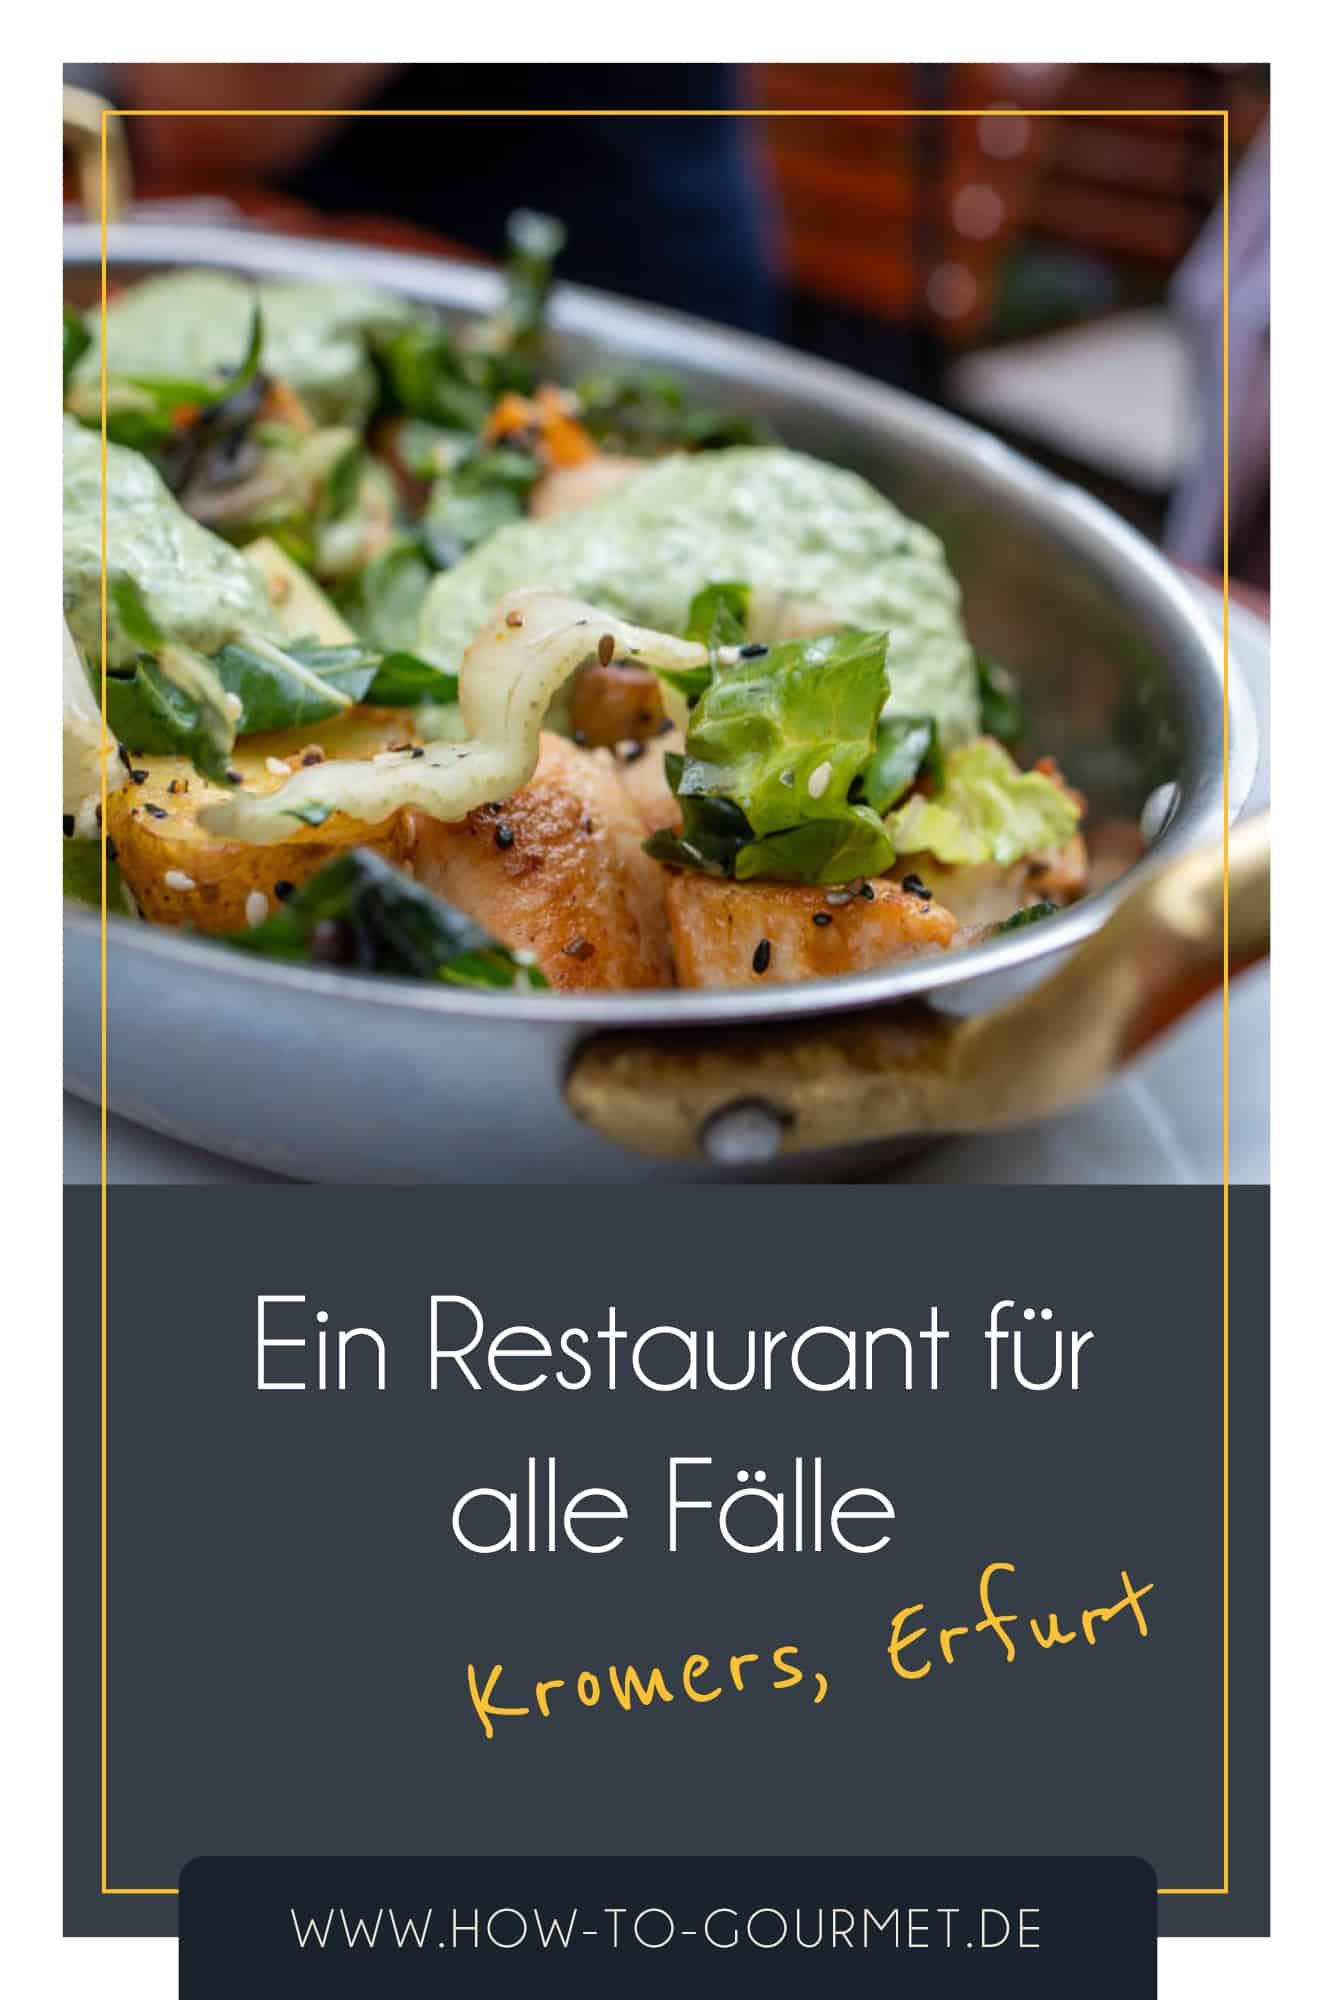 restaurant Kromers Erfurt